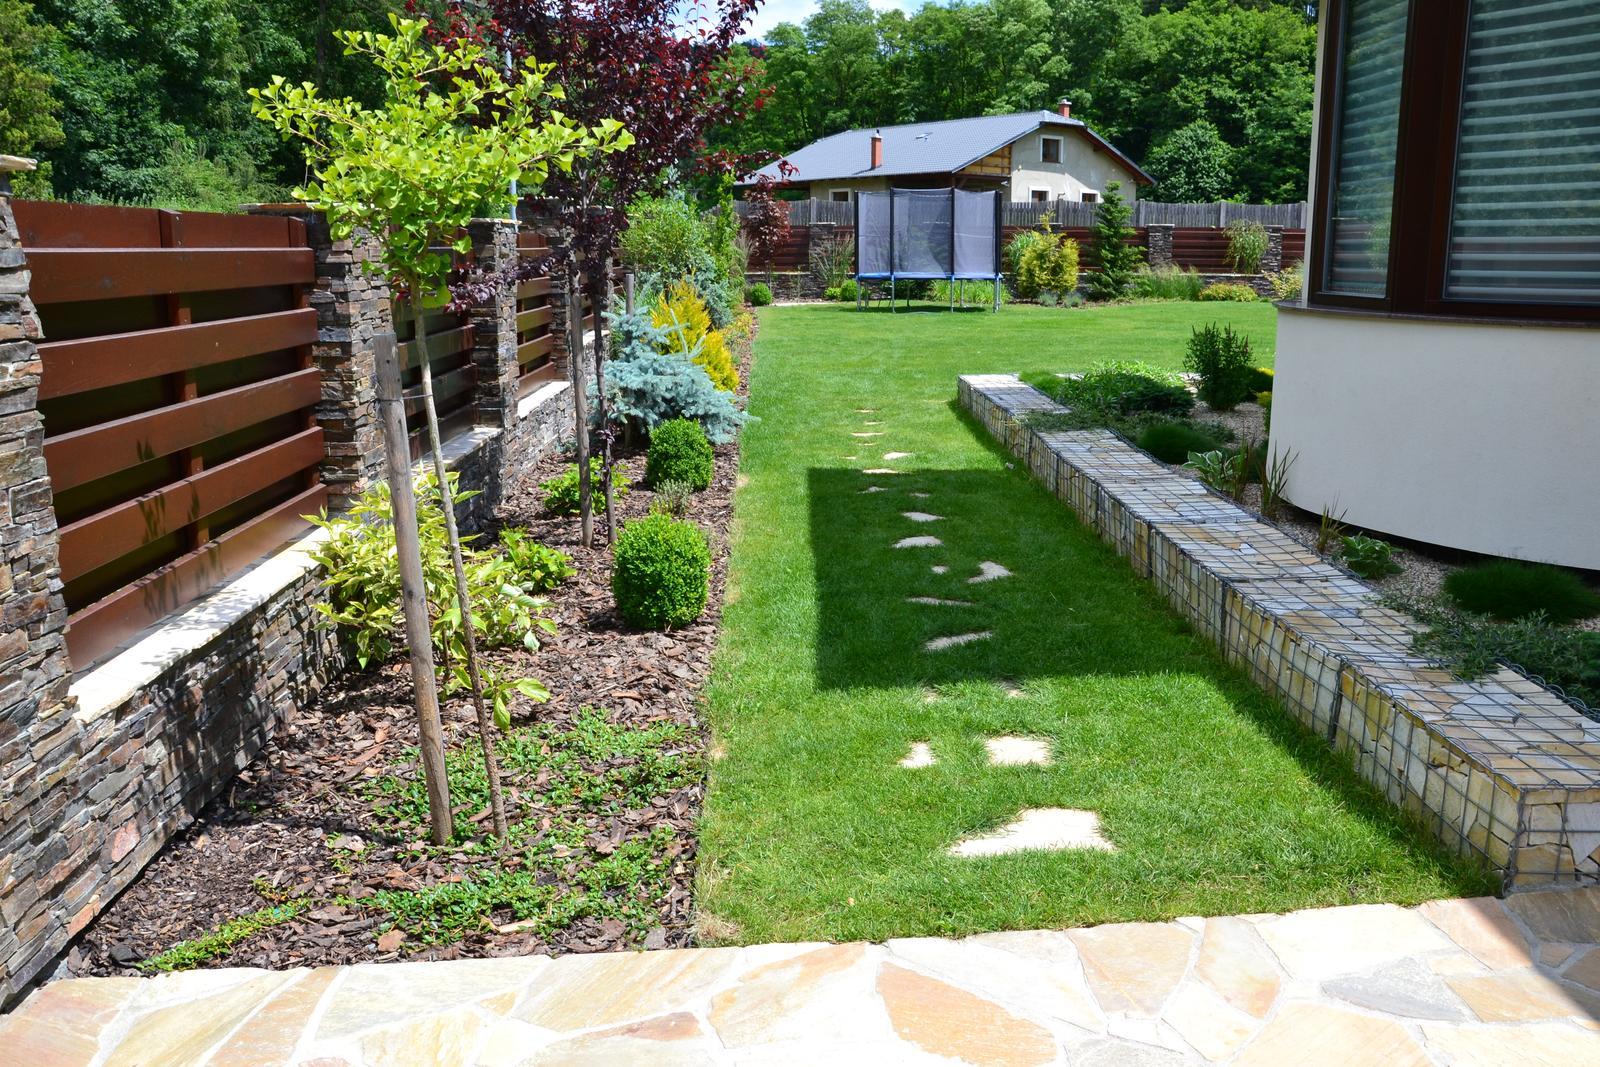 Zahrada - Obrázek č. 92